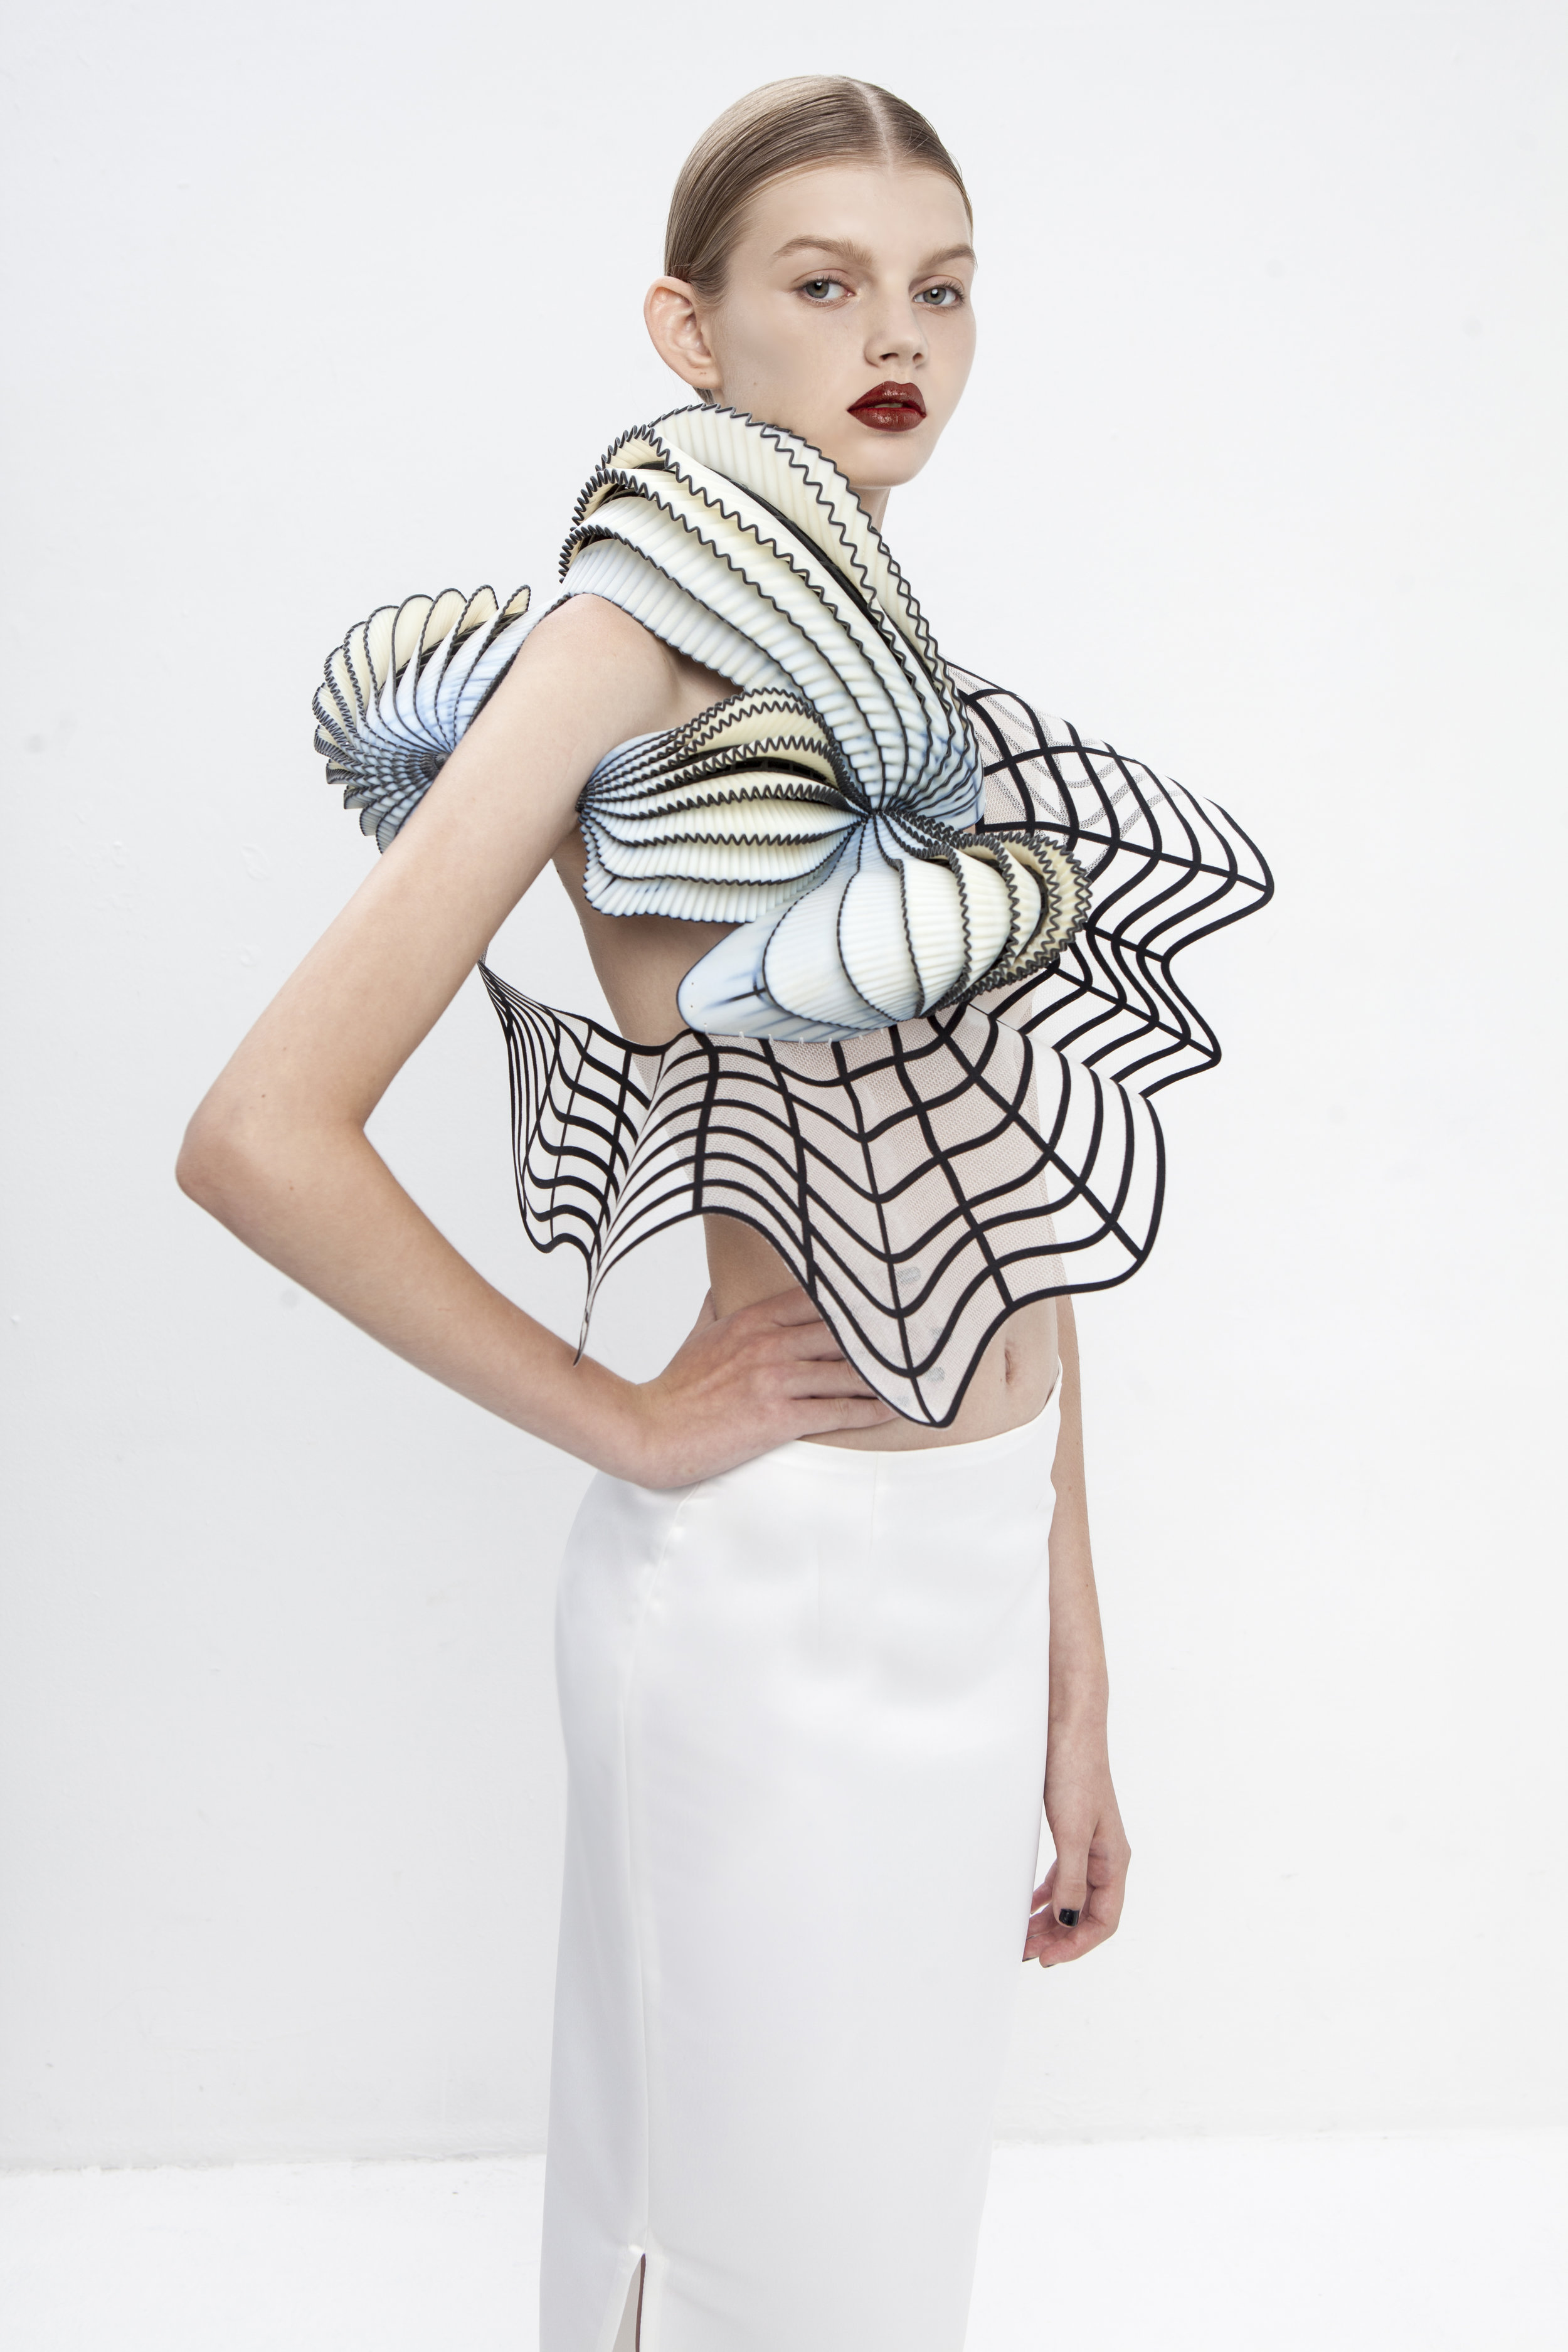 HARD COPY Dresses - Stratasys Objet500 Connex3